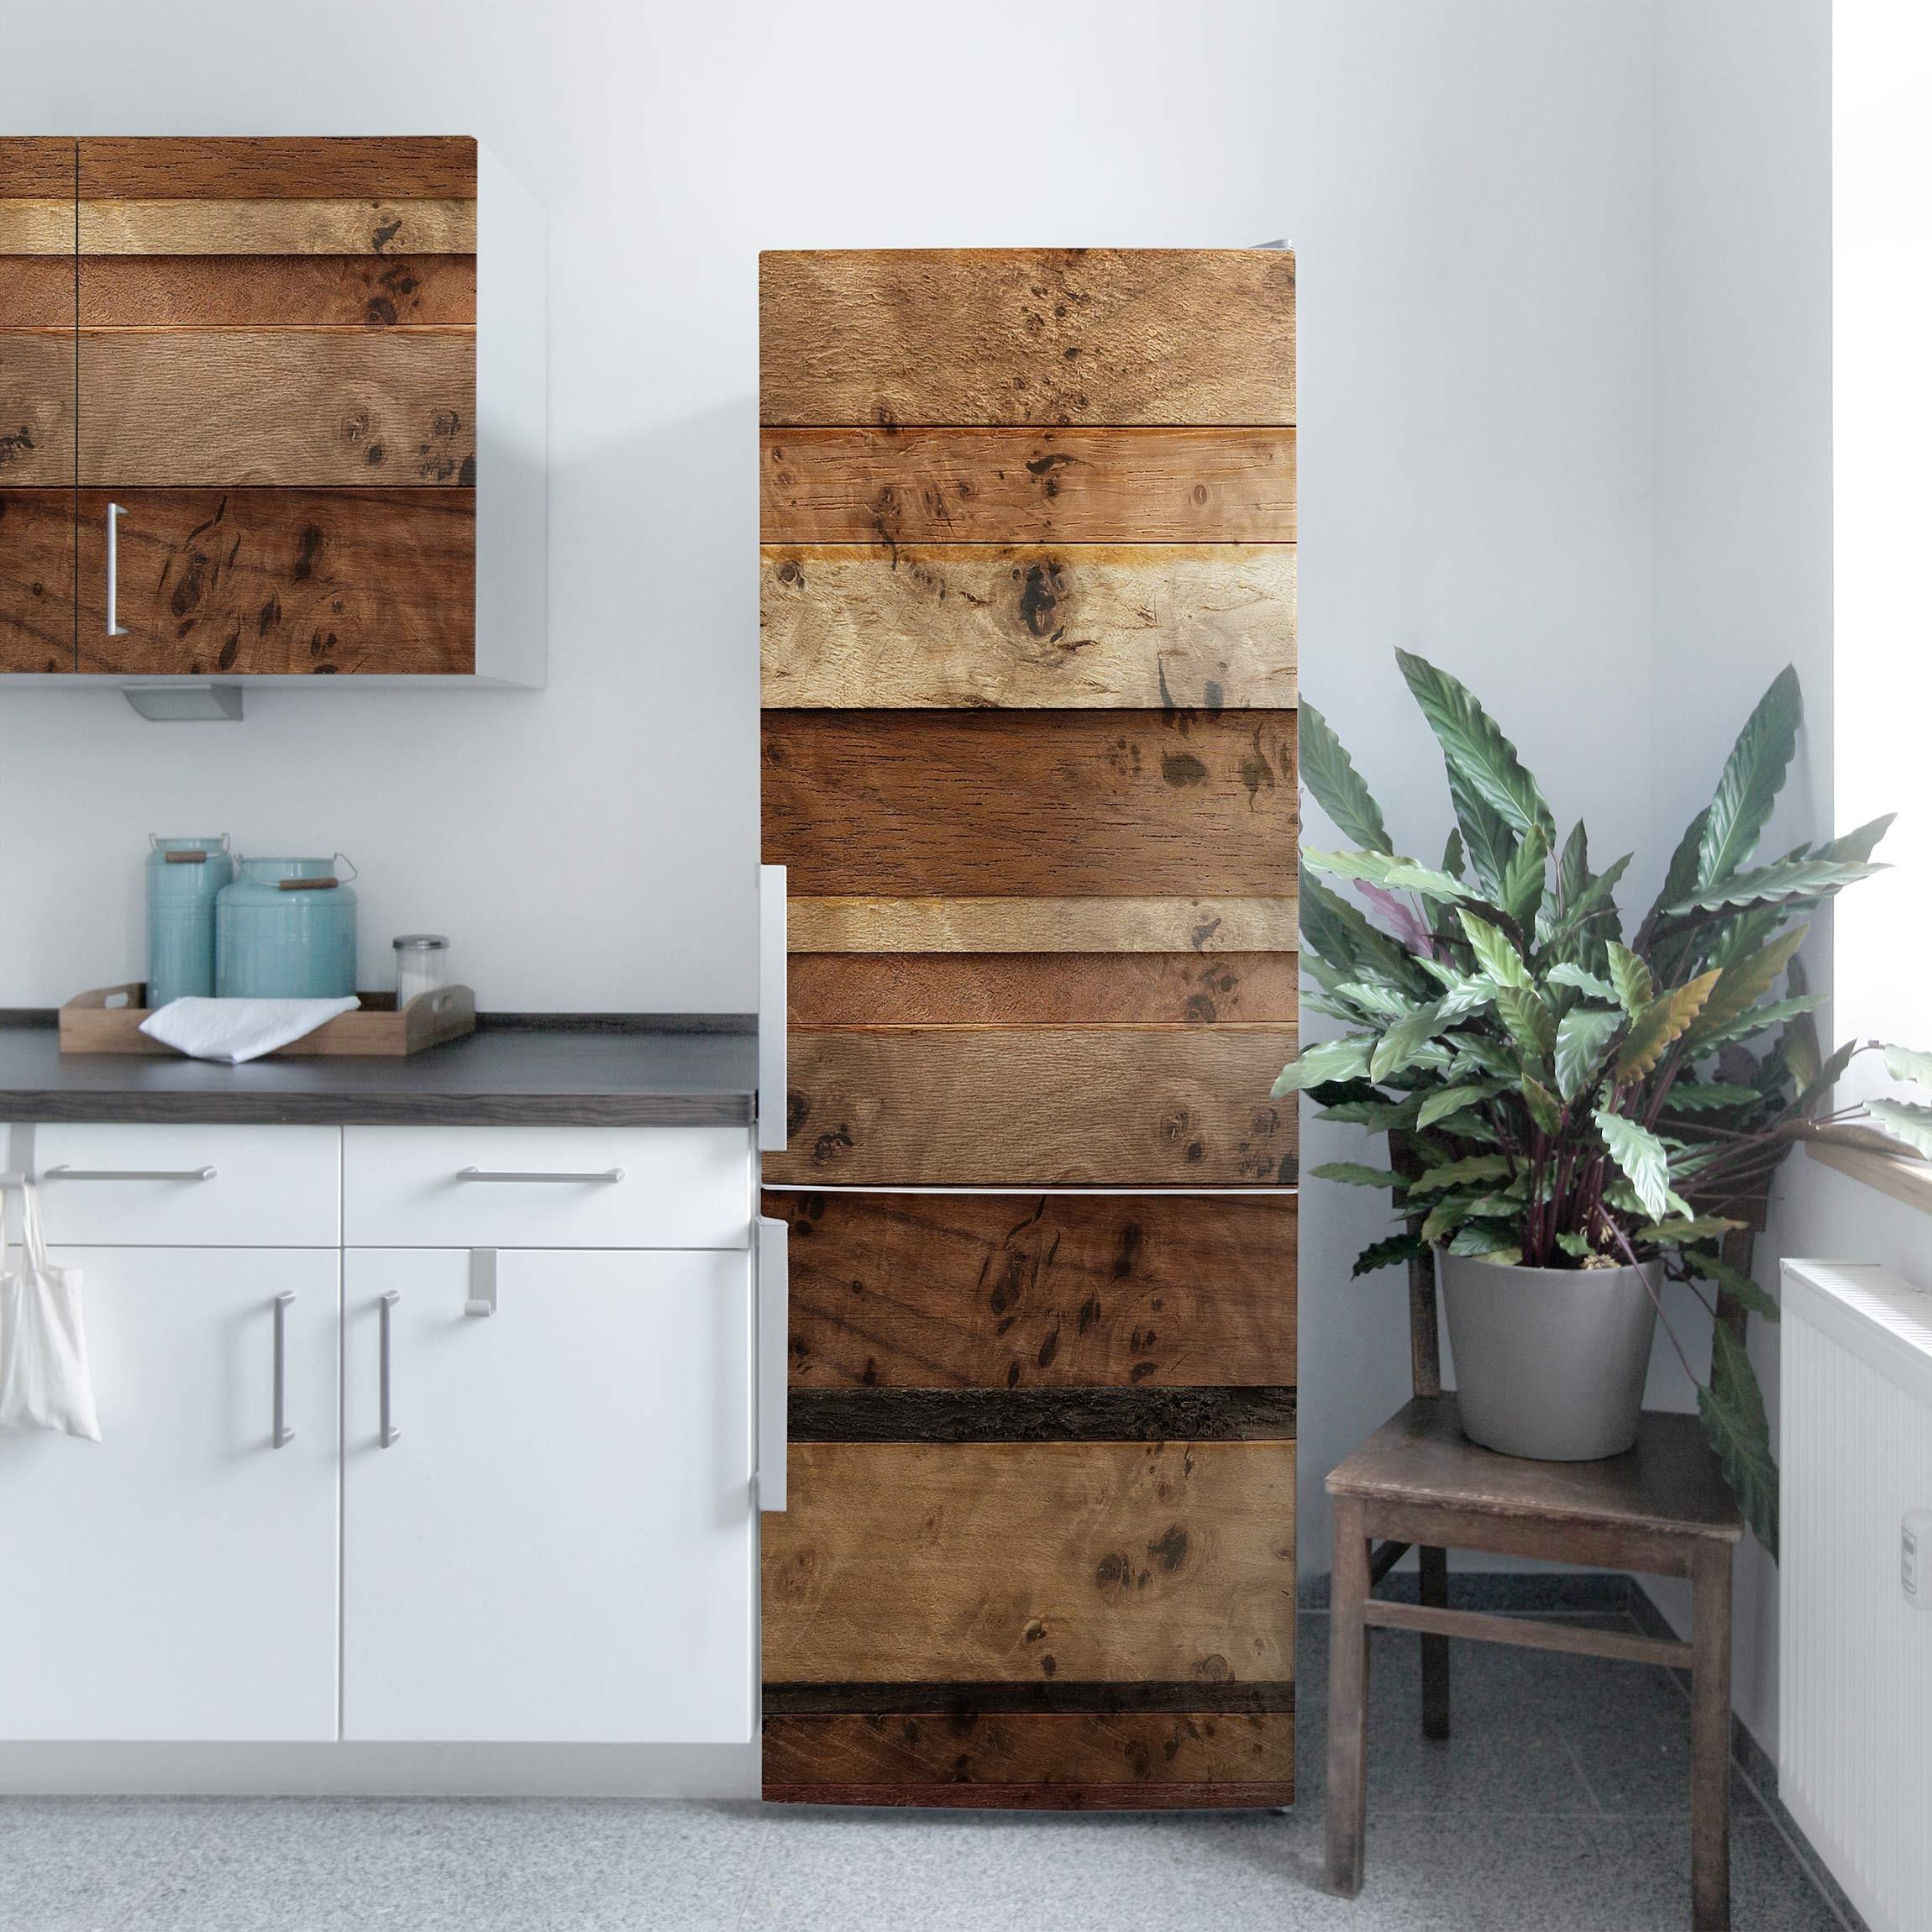 Carta adesiva per mobili woody birdseye - Carta per ricoprire mobili ...